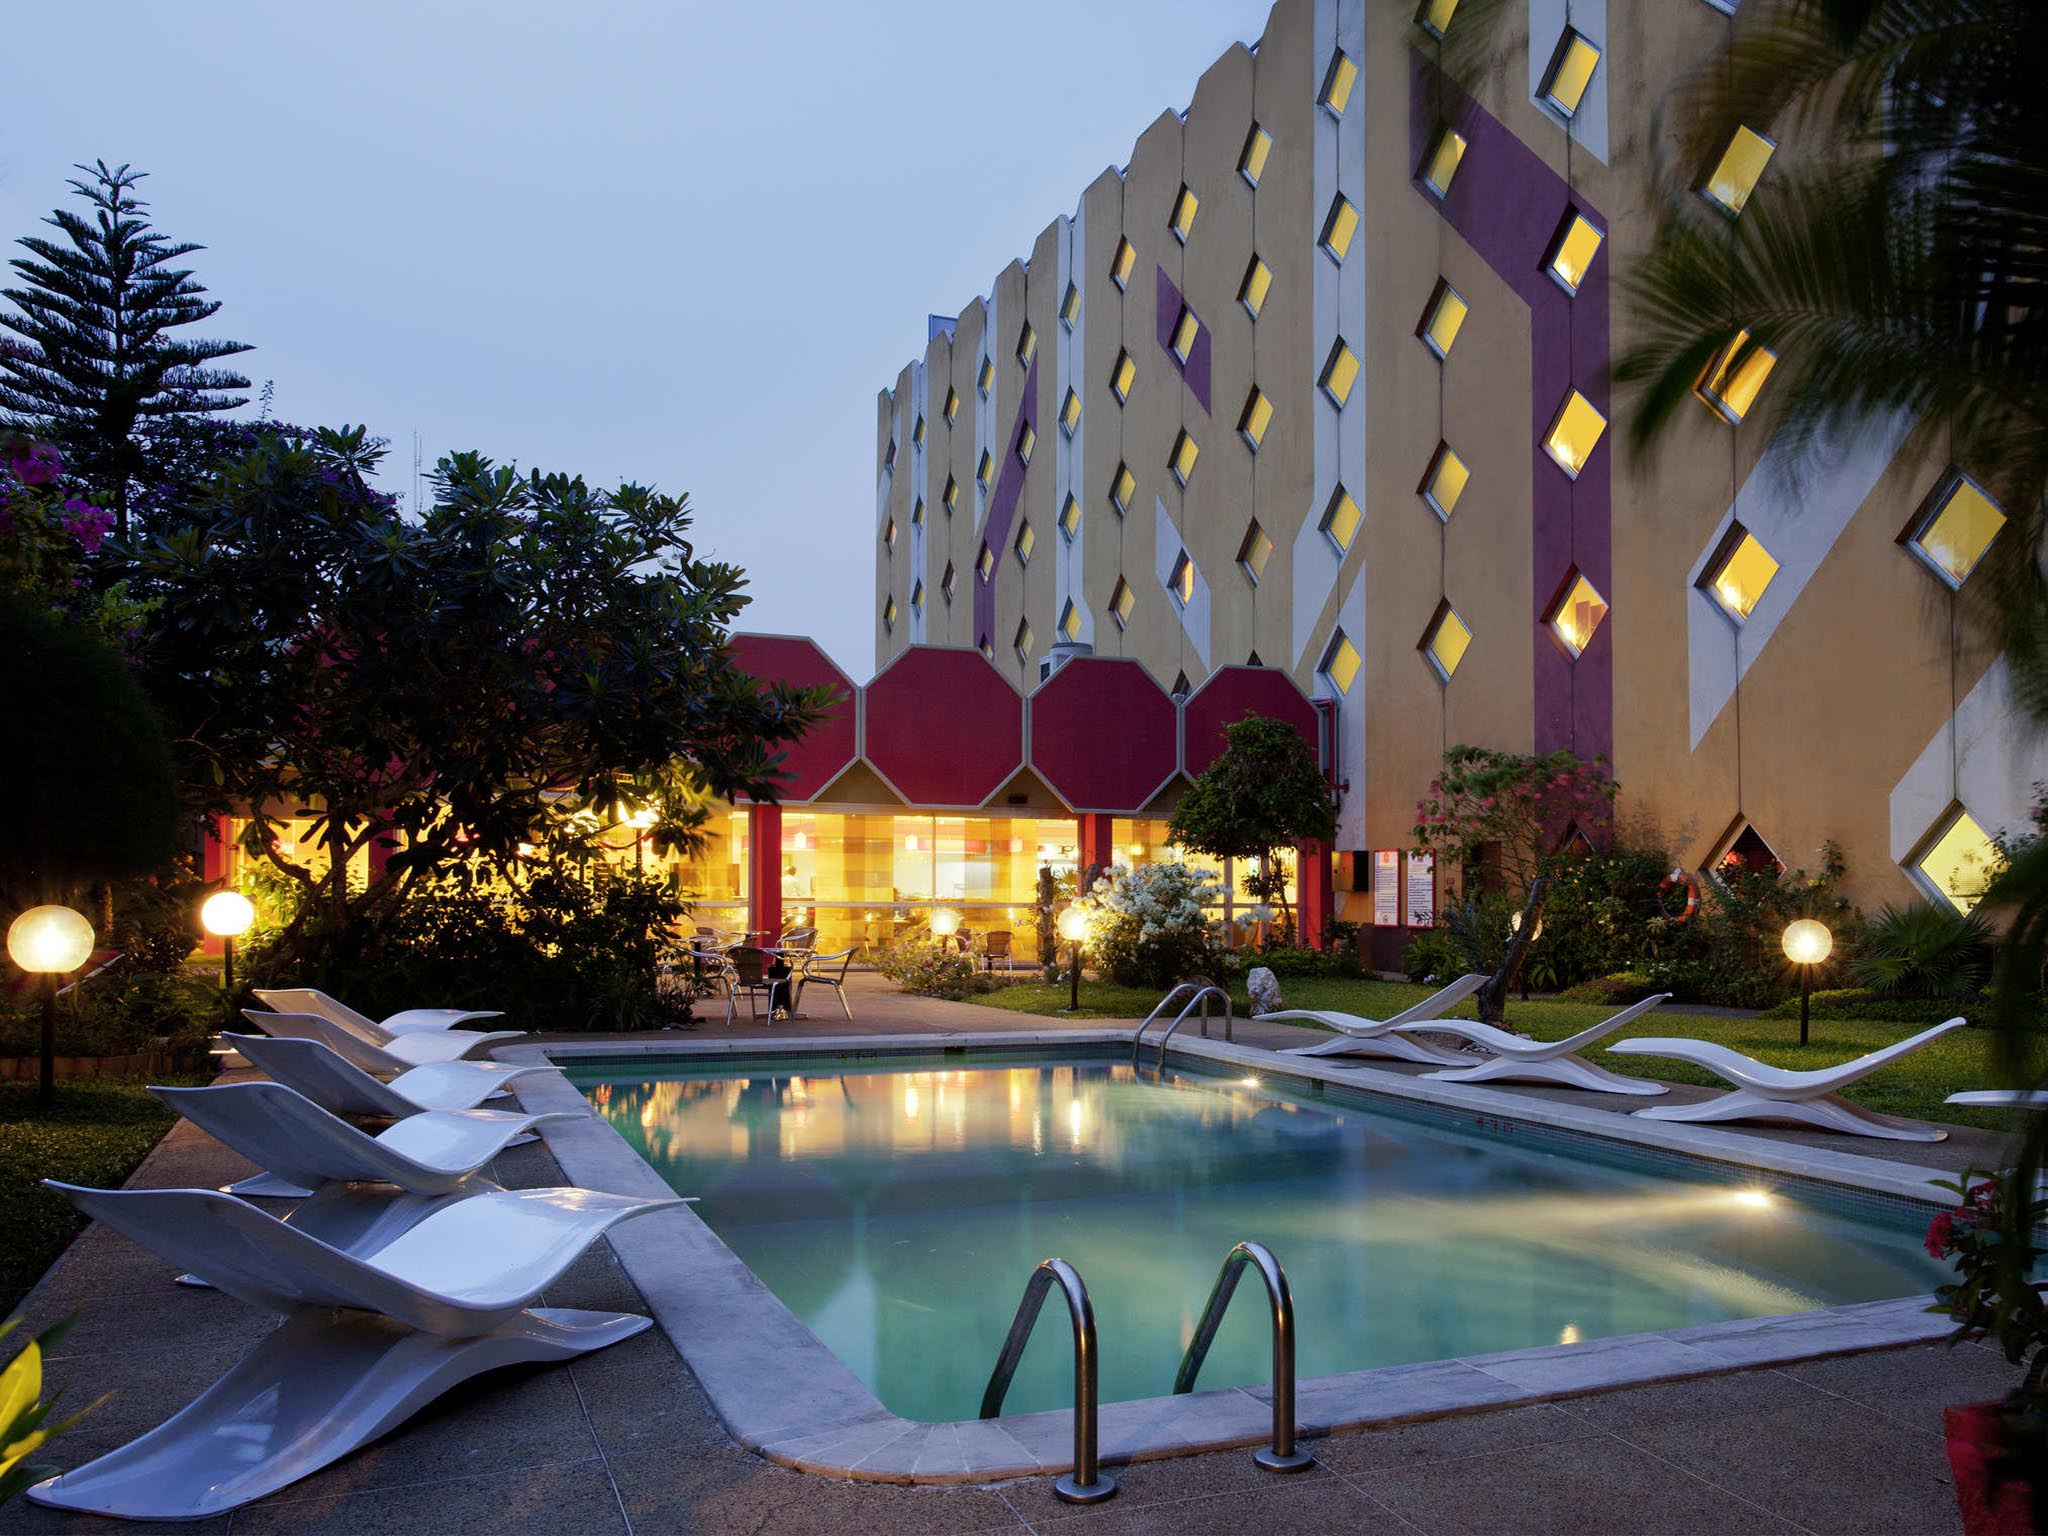 Hotel Ibis Plateau Abidjan